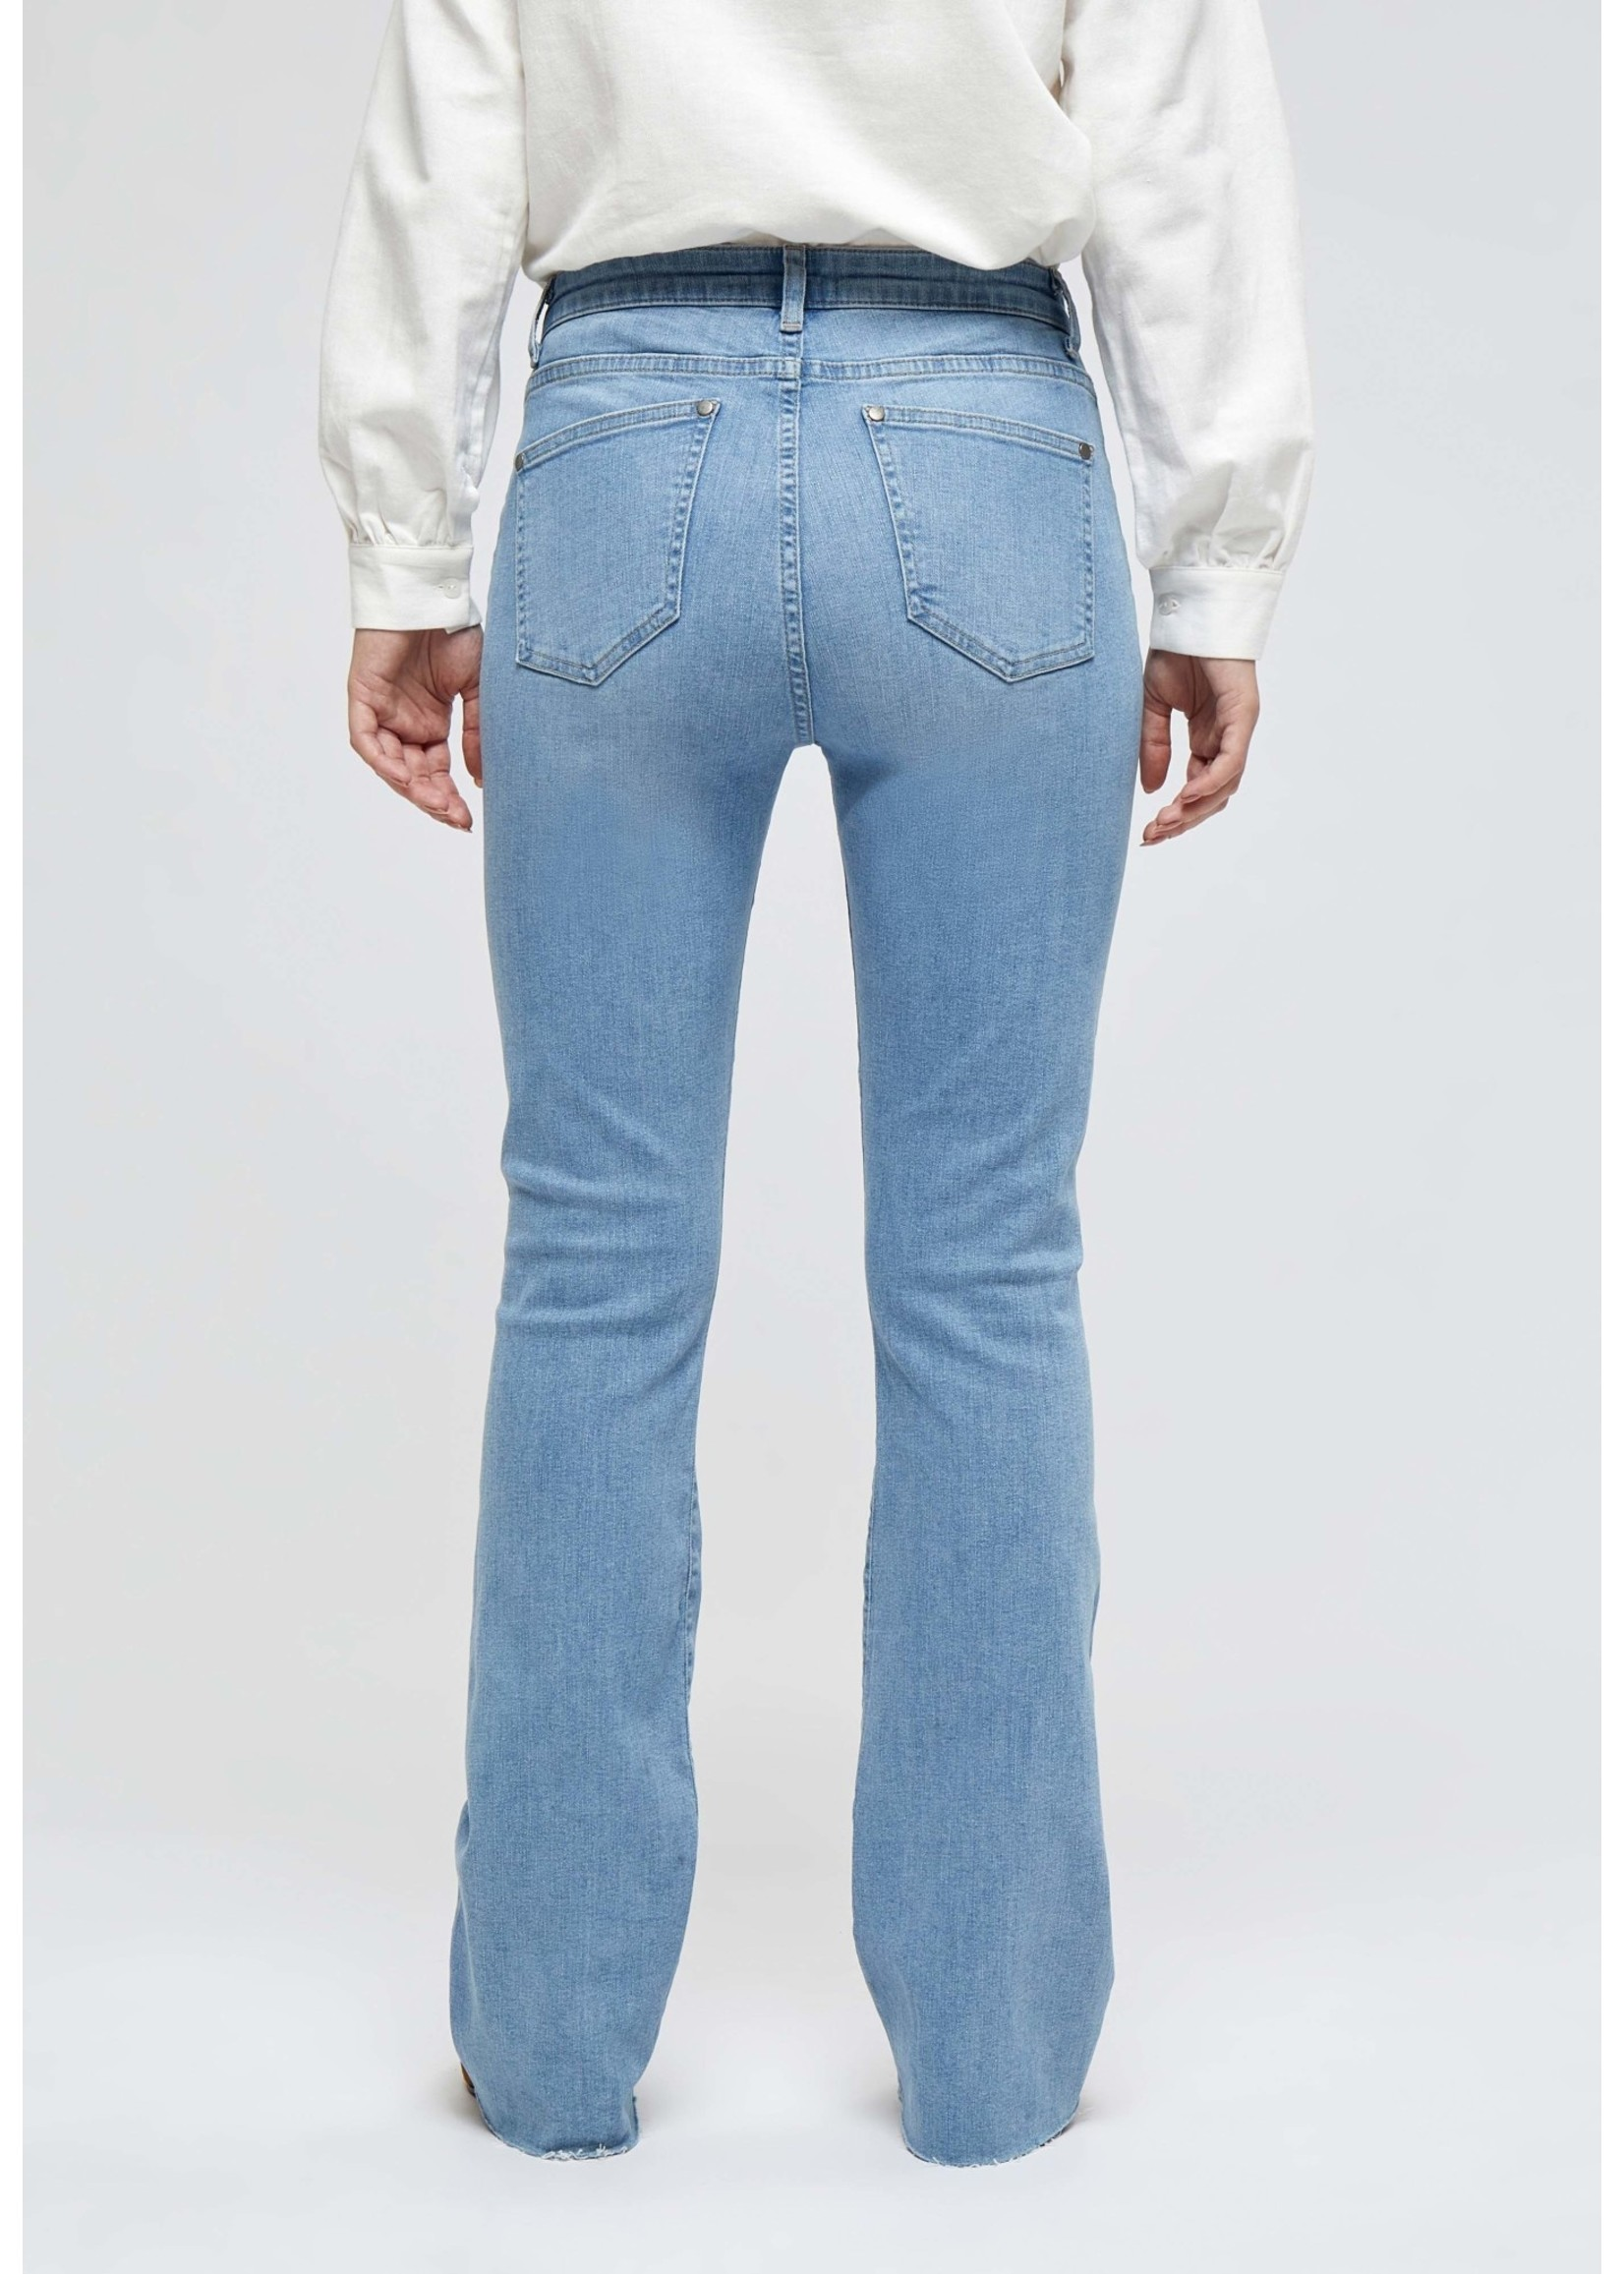 MINUS New enzo jeans Light Denim